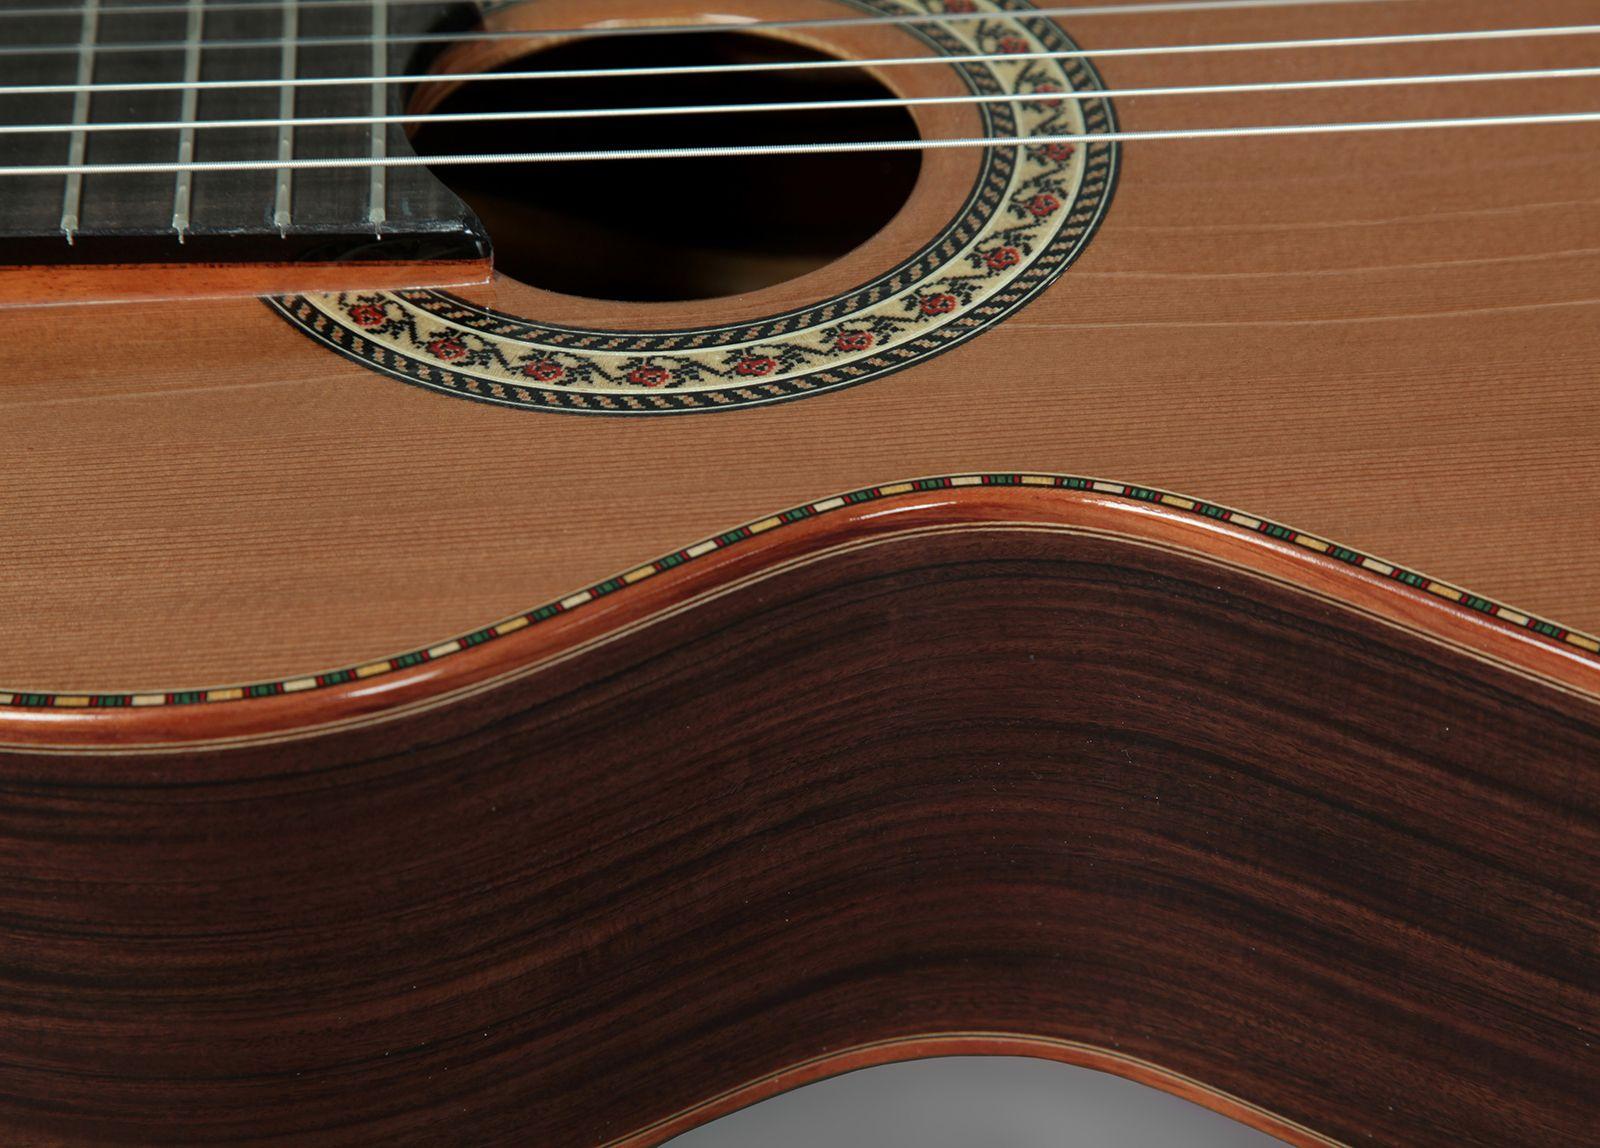 romantic_guitar07